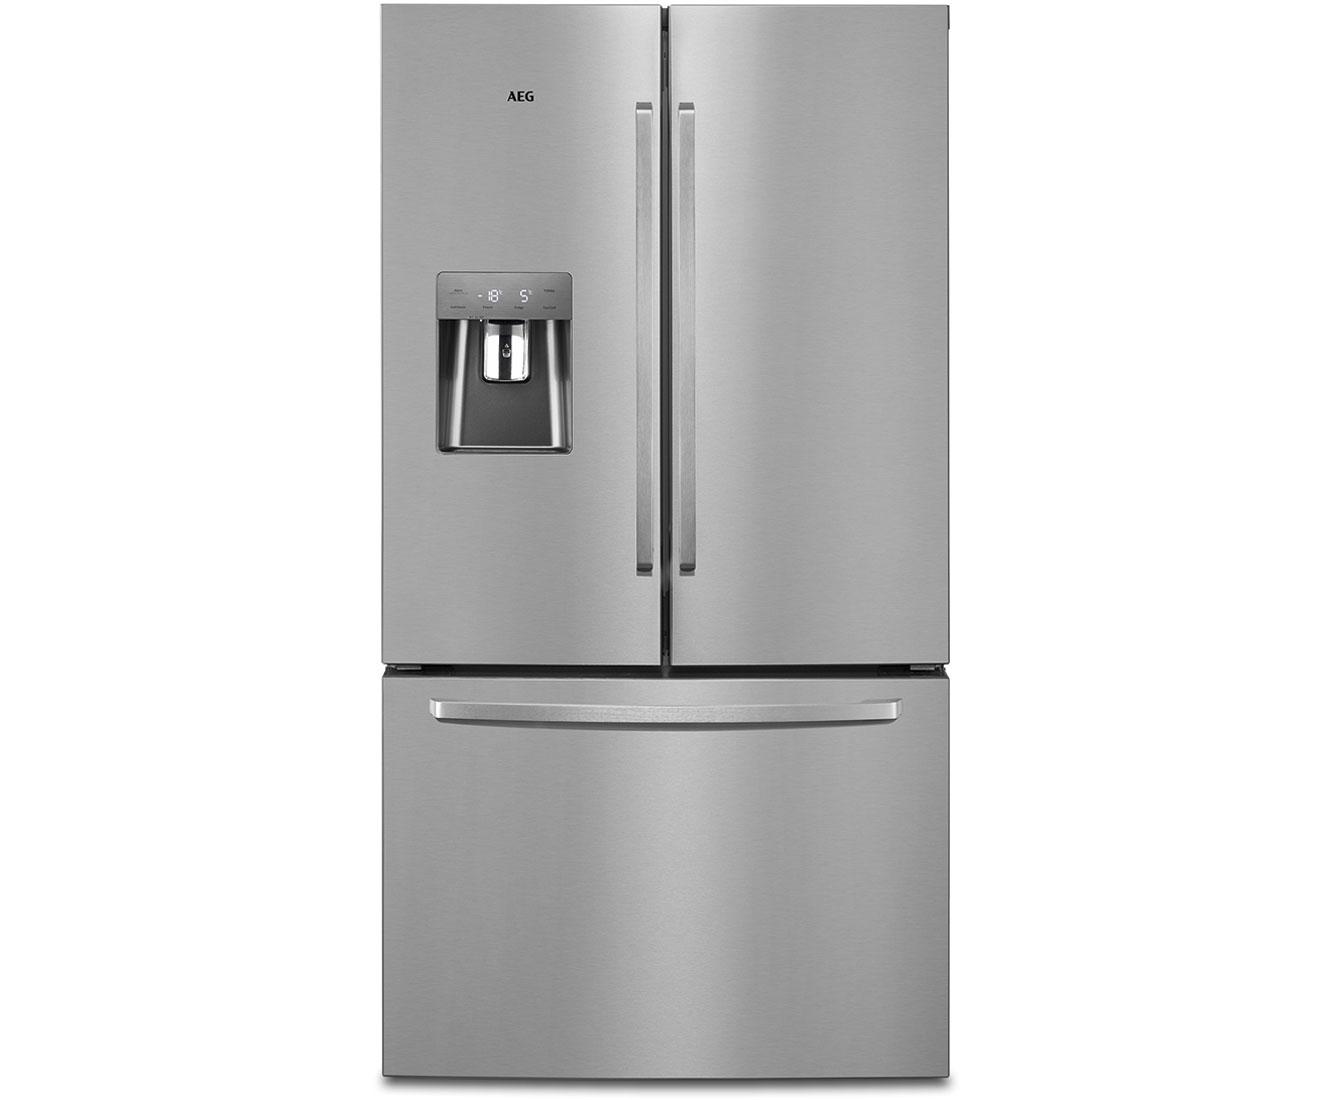 Aeg Kühlschrank Wo Hergestellt : Aeg kühlschrank wo hergestellt kühlschrank von vielen top marken